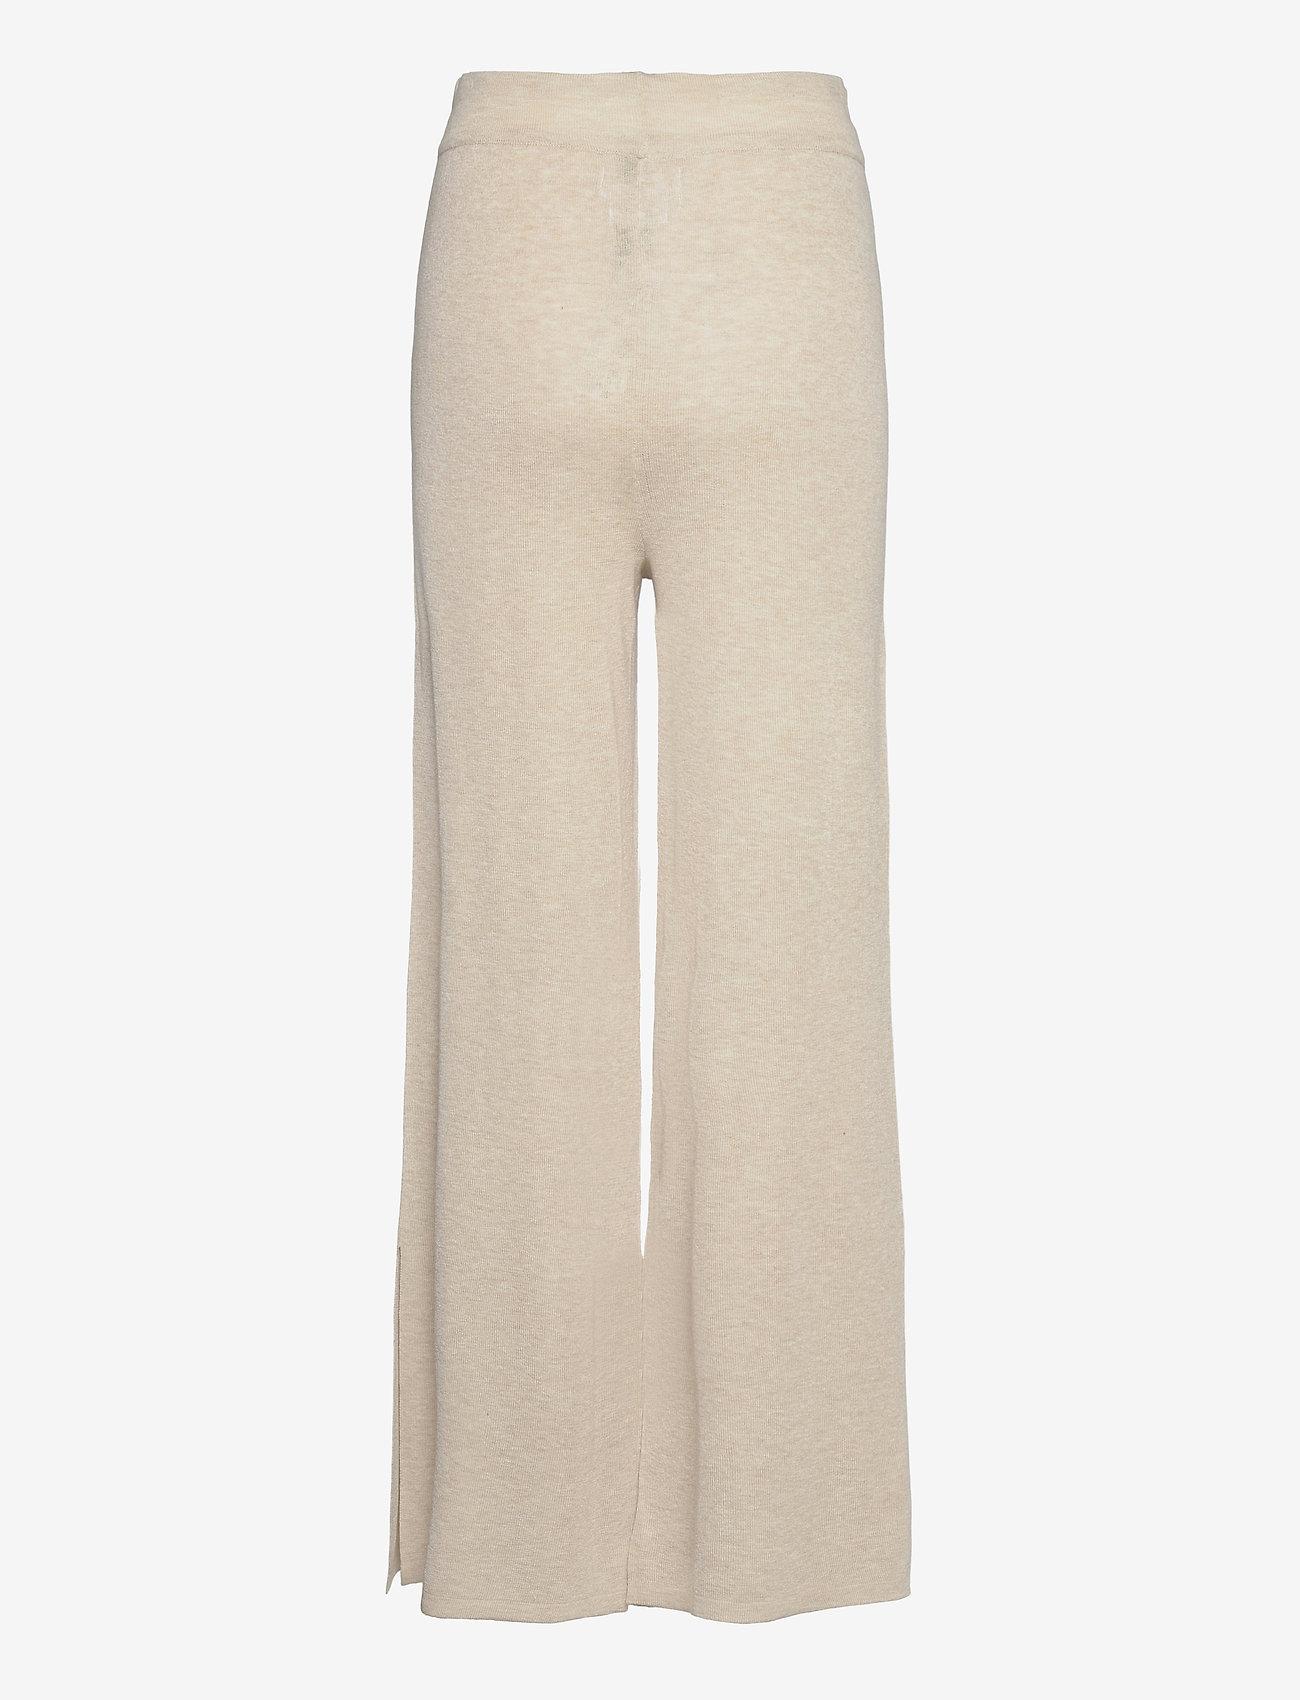 Mango - TOBIAS - bukser med brede ben - stone - 1